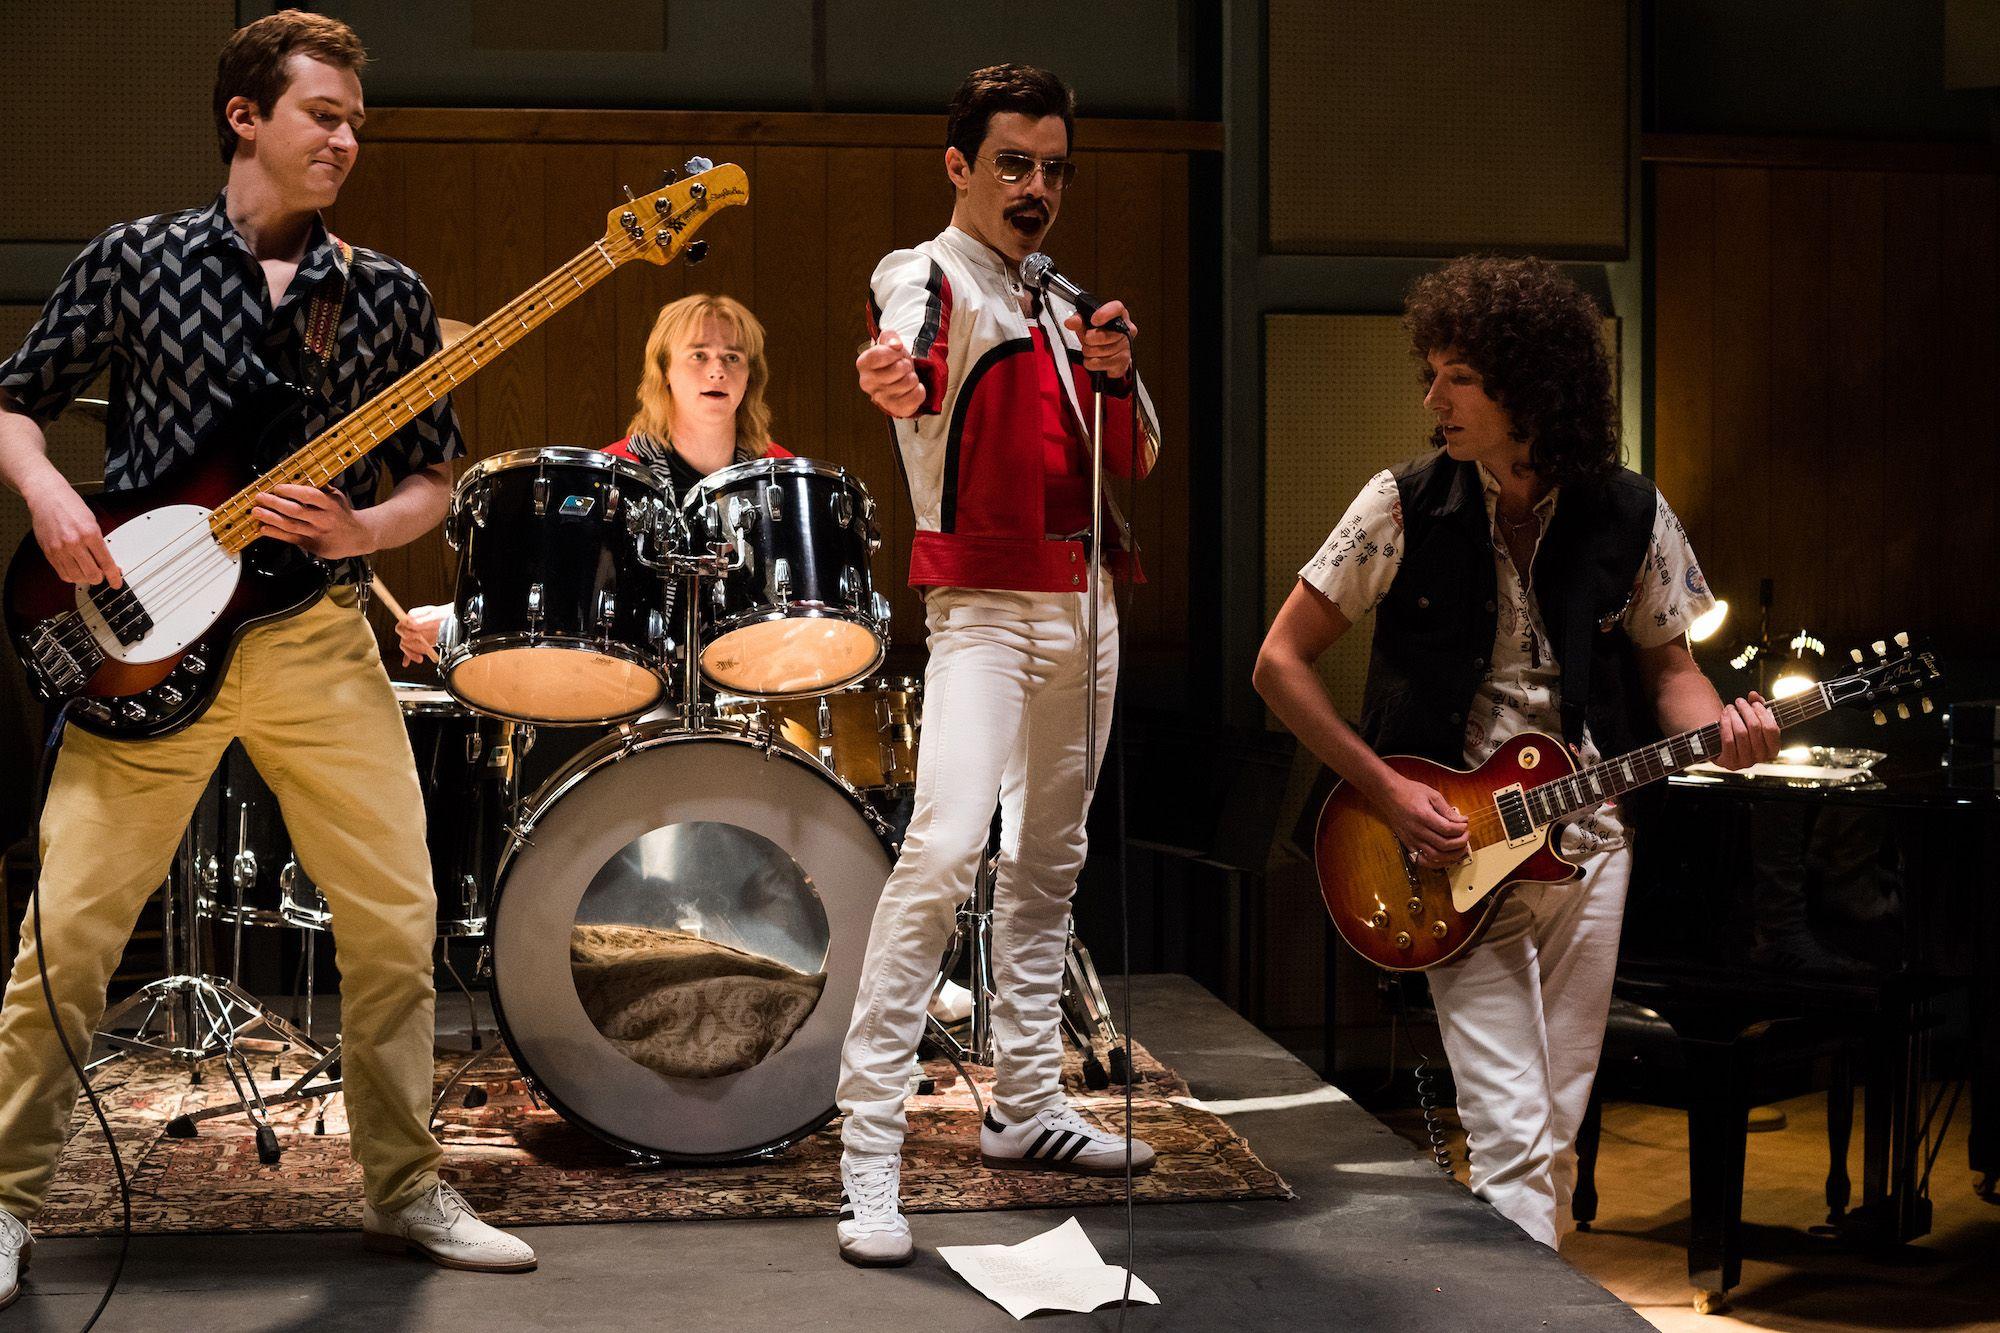 نقد فیلم Bohemian Rhapsody | حماسهی کولی